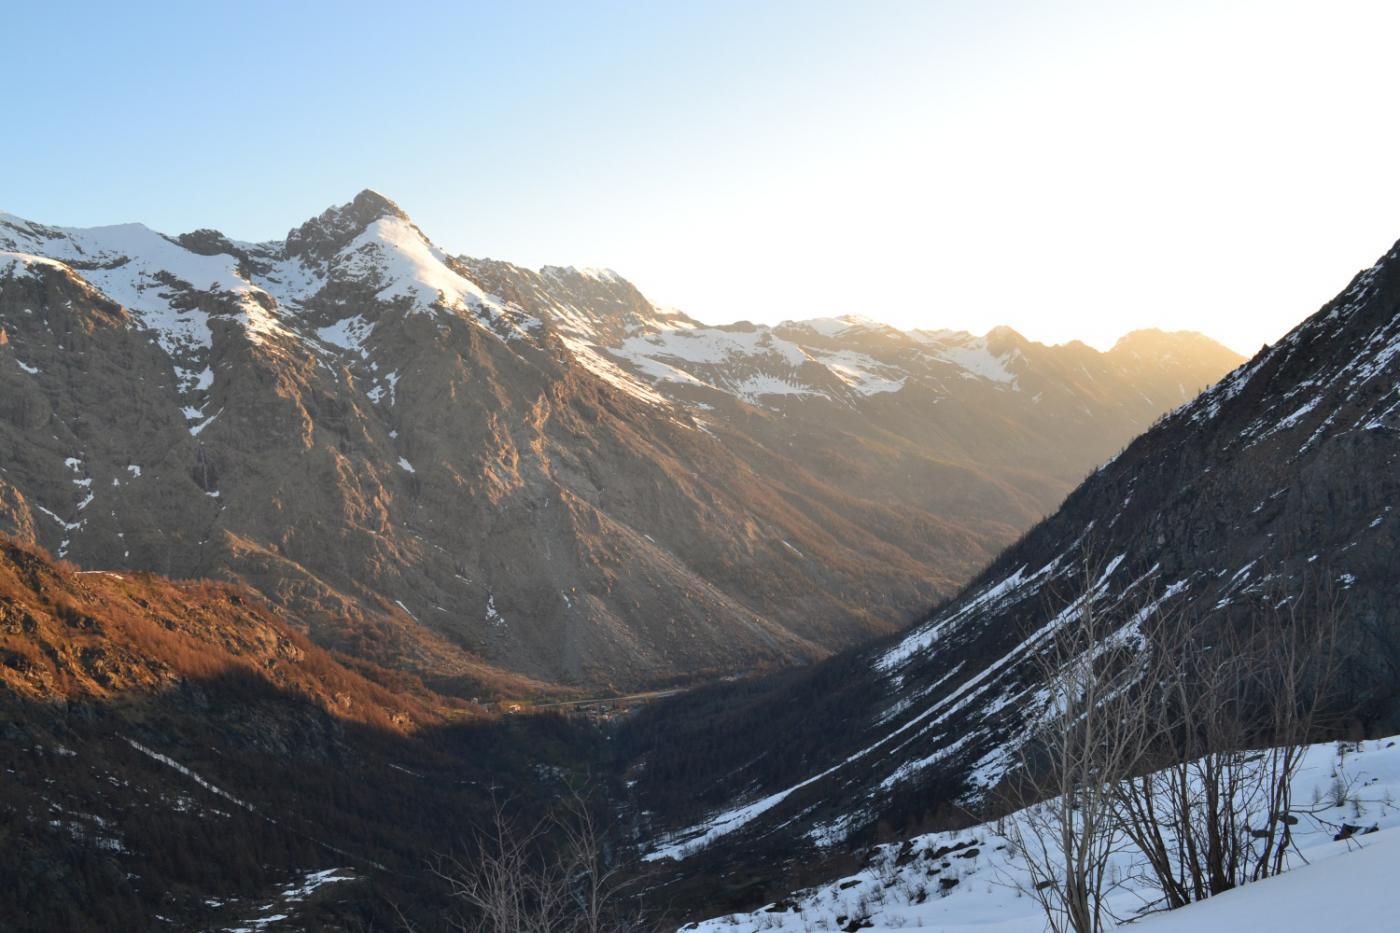 vista verso valle salendo